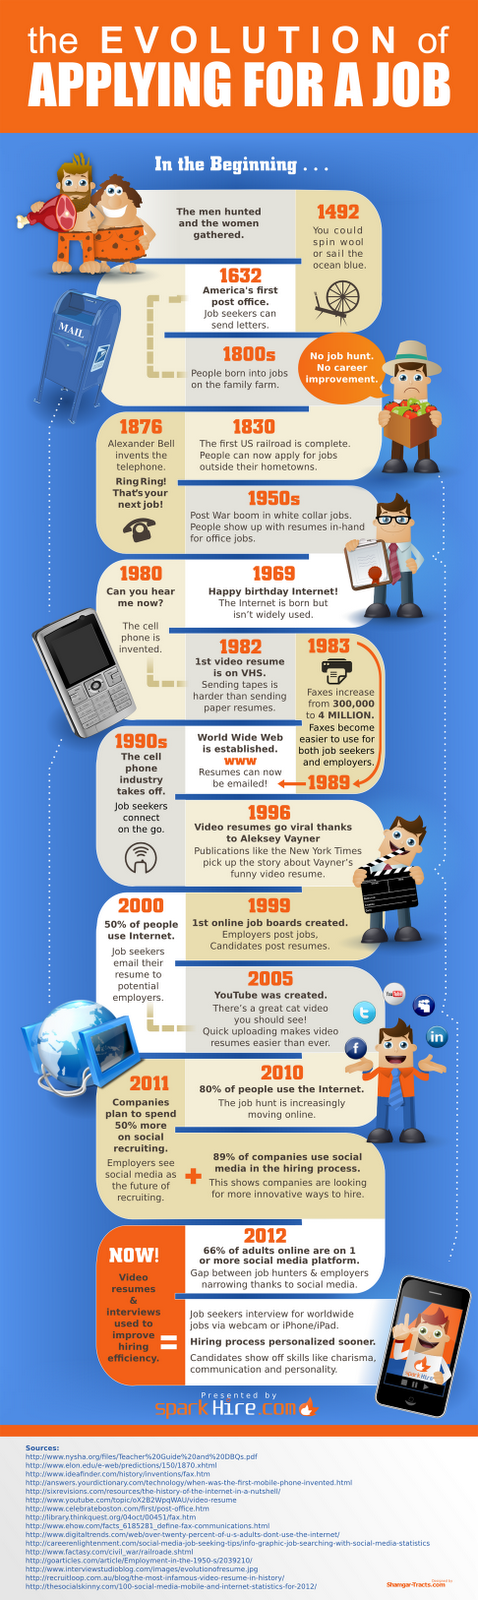 "<img src=""Evolution of Applying for a job infographic"" alt=""infographic"">"